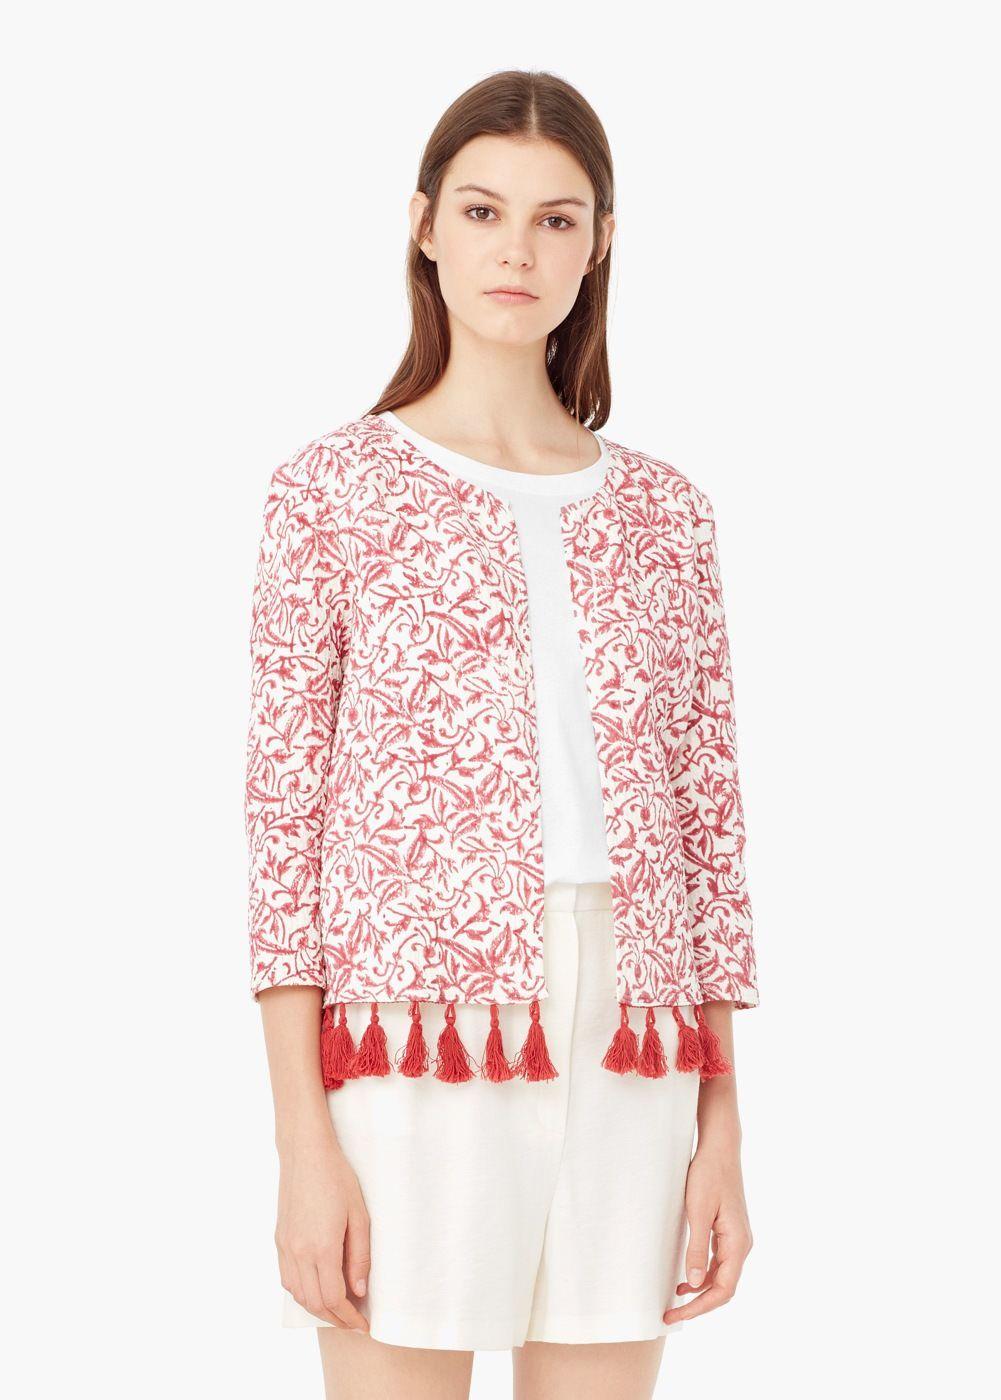 995ed5585b Printed cotton jacket - Woman v roku 2019